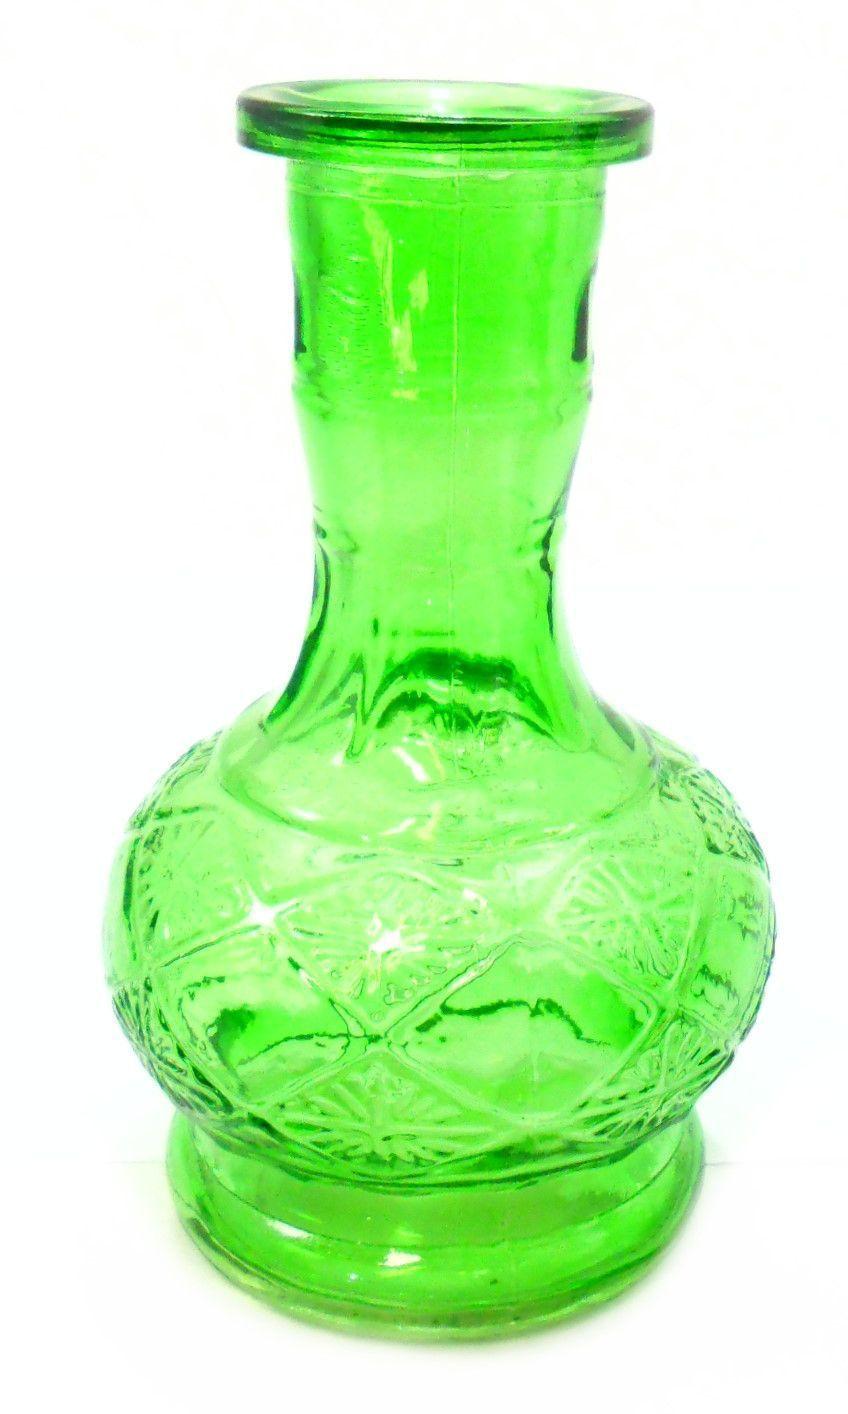 Vaso/base para narguile. 20cm altura e 3,7cm diâmetro do encaixe. Verde